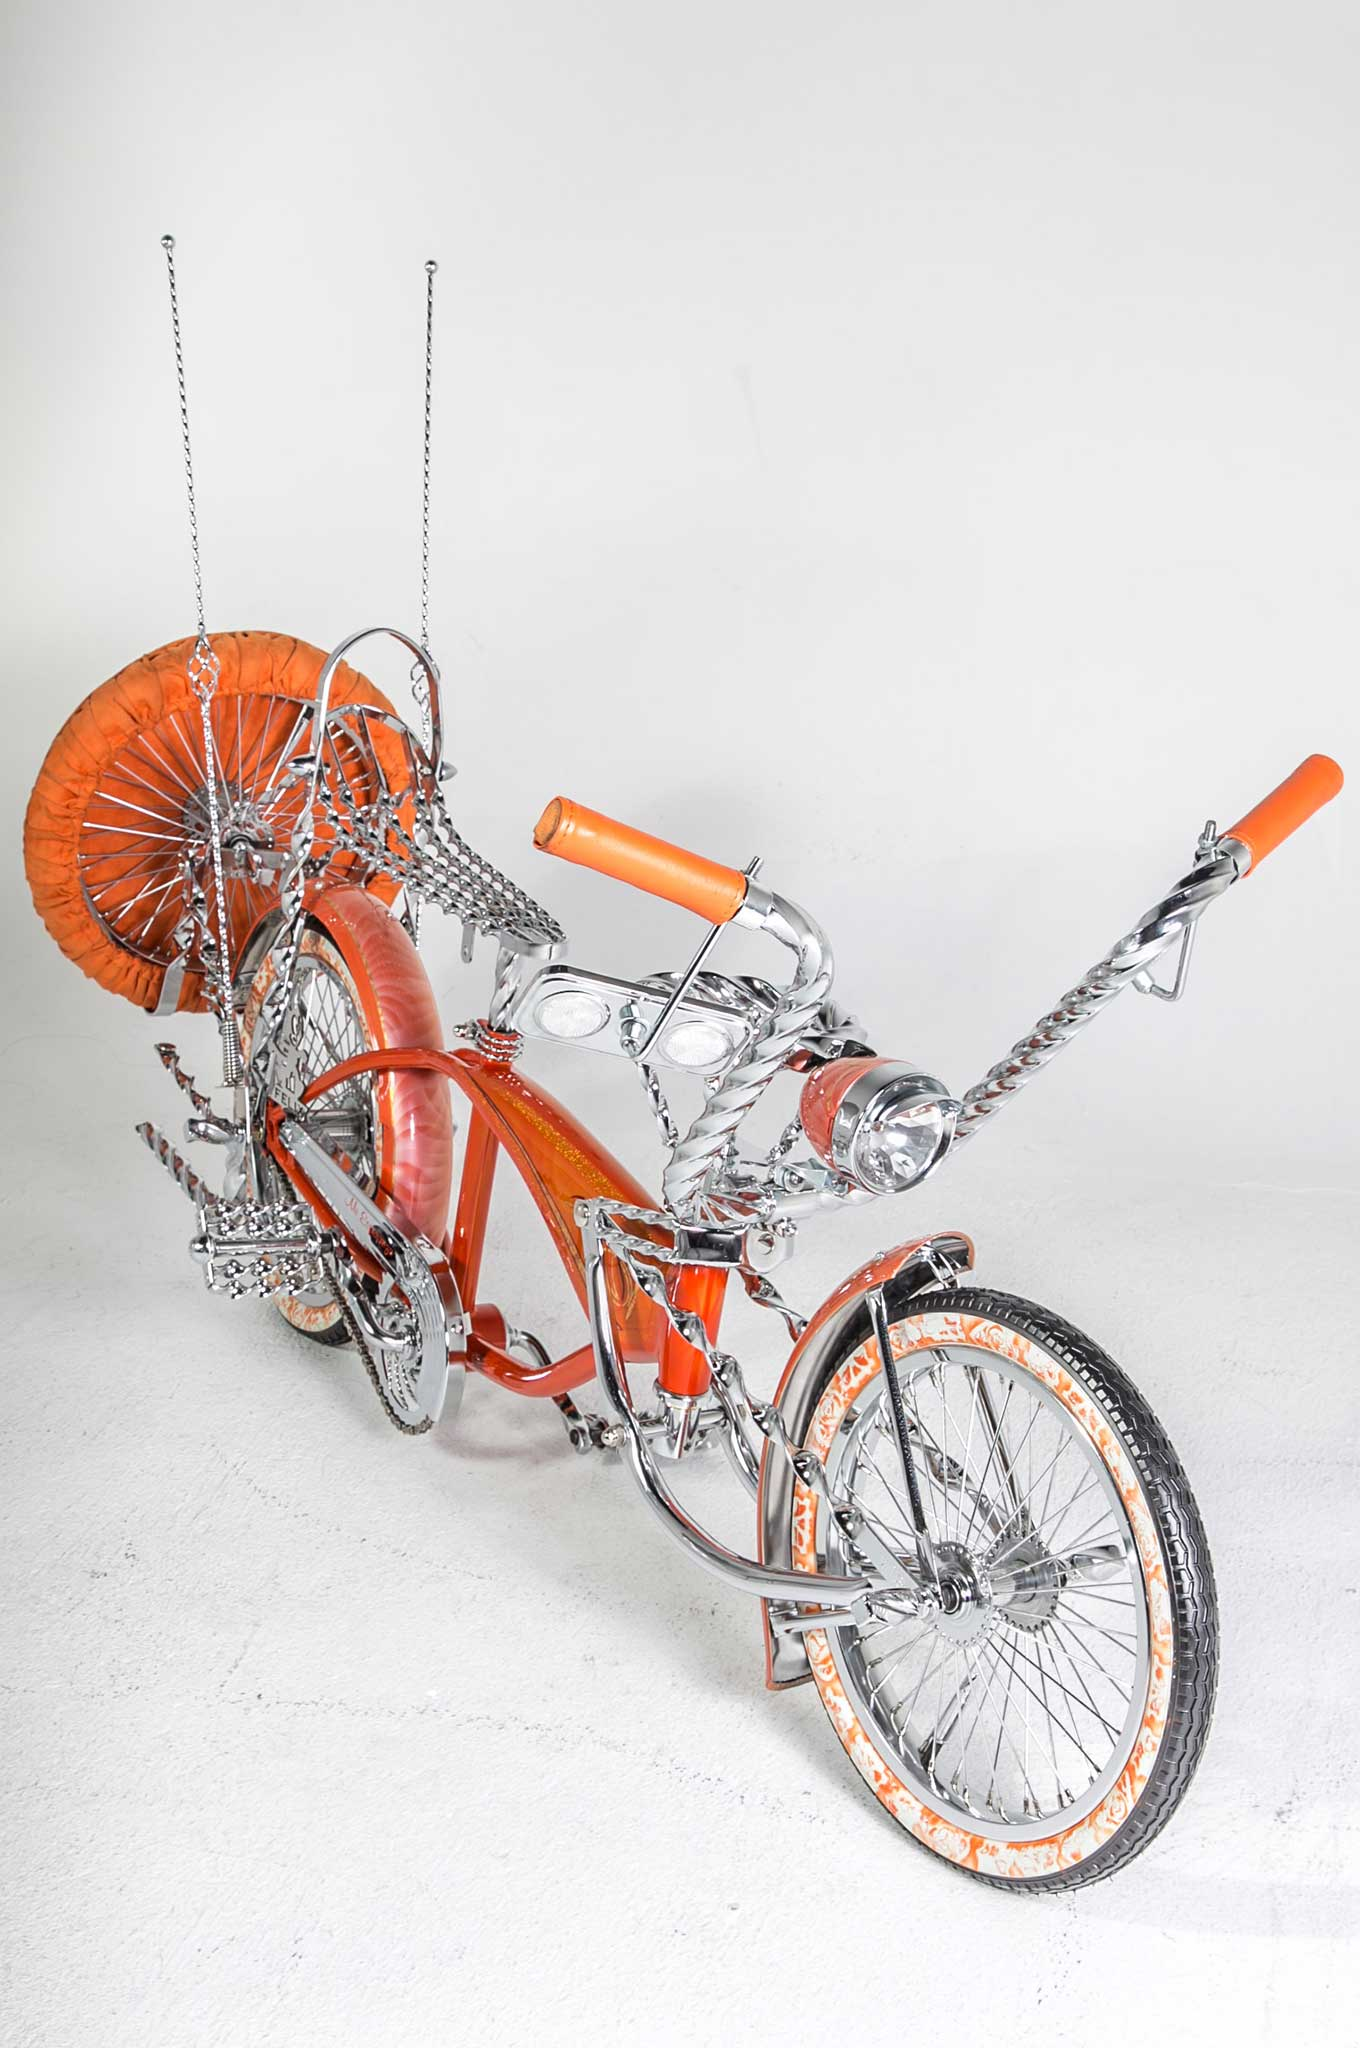 1996 16-inch Lowrider Bike - The Godfather - Lowrider